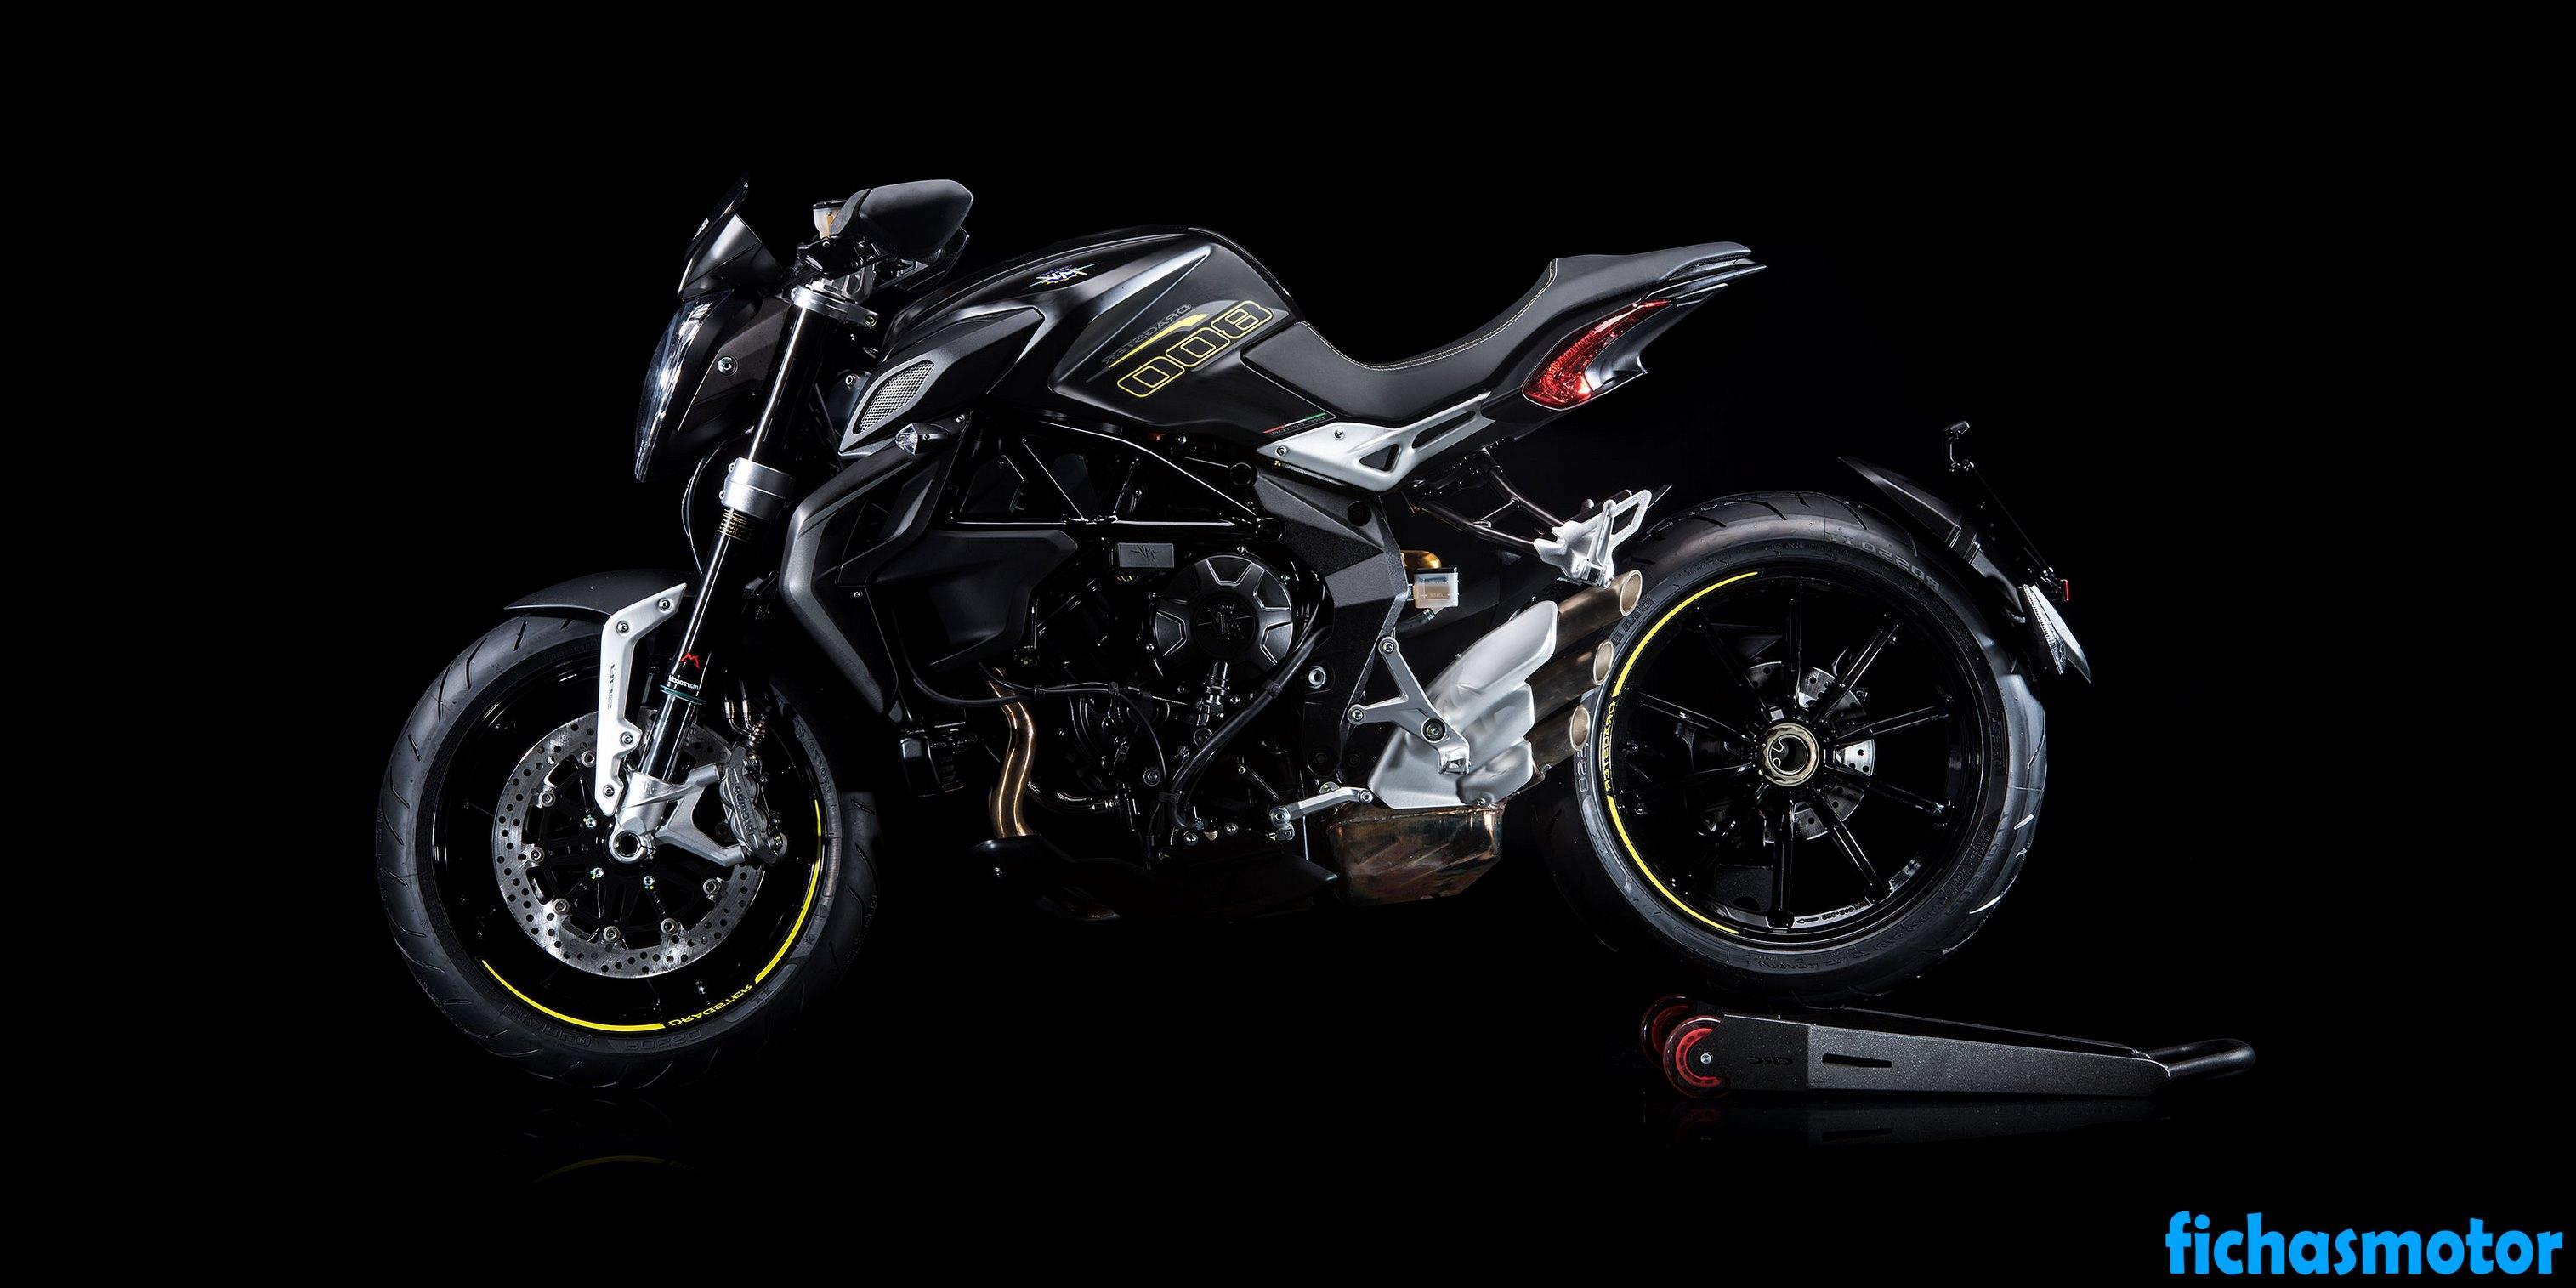 Ficha técnica Mv agusta dragster 800 2018